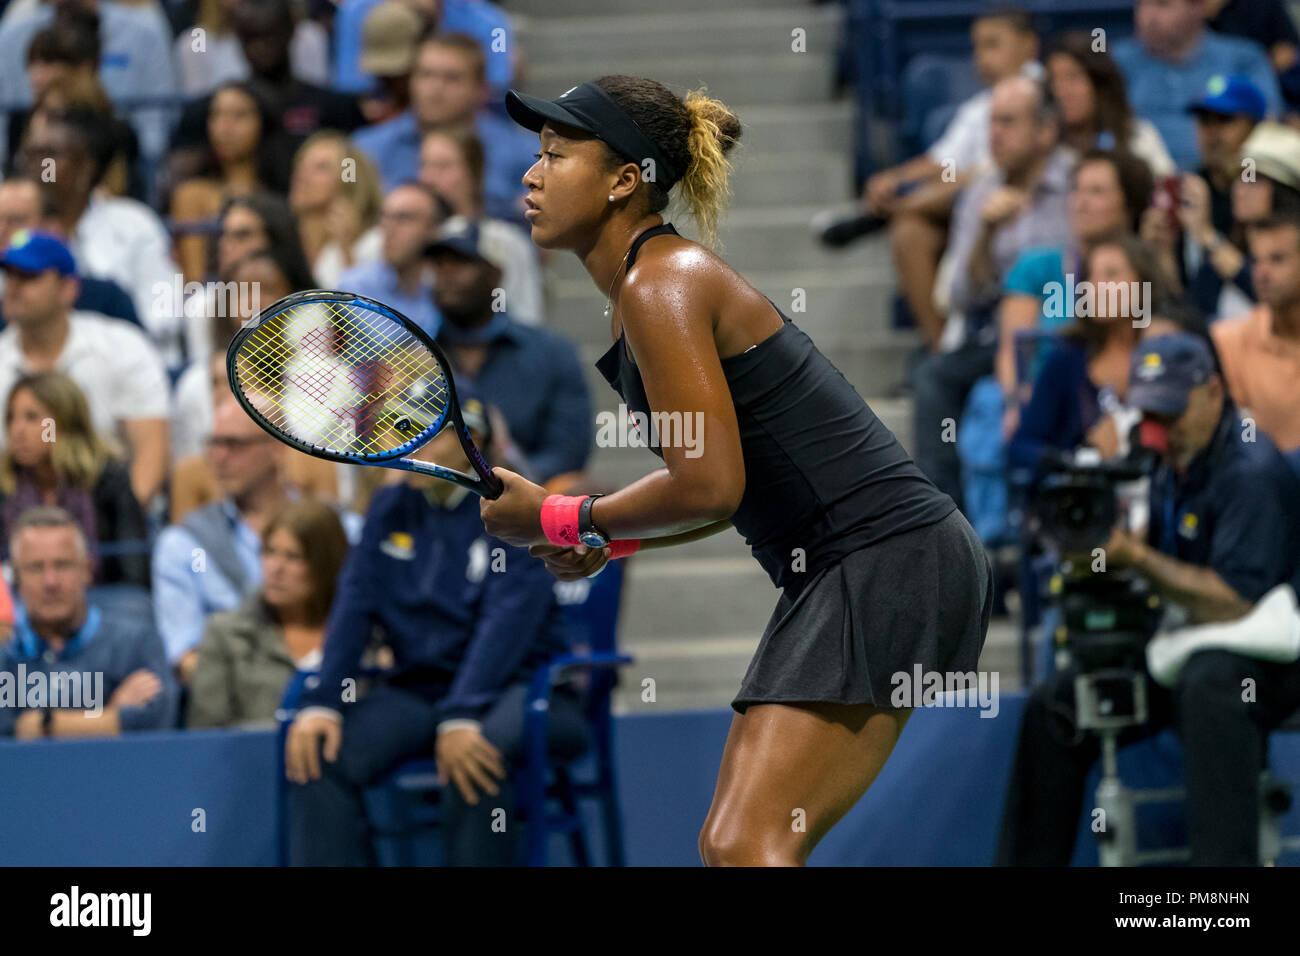 Naomi Osaka (JPN) during the women's final at the 2018 US Open Tennis. - Stock Image